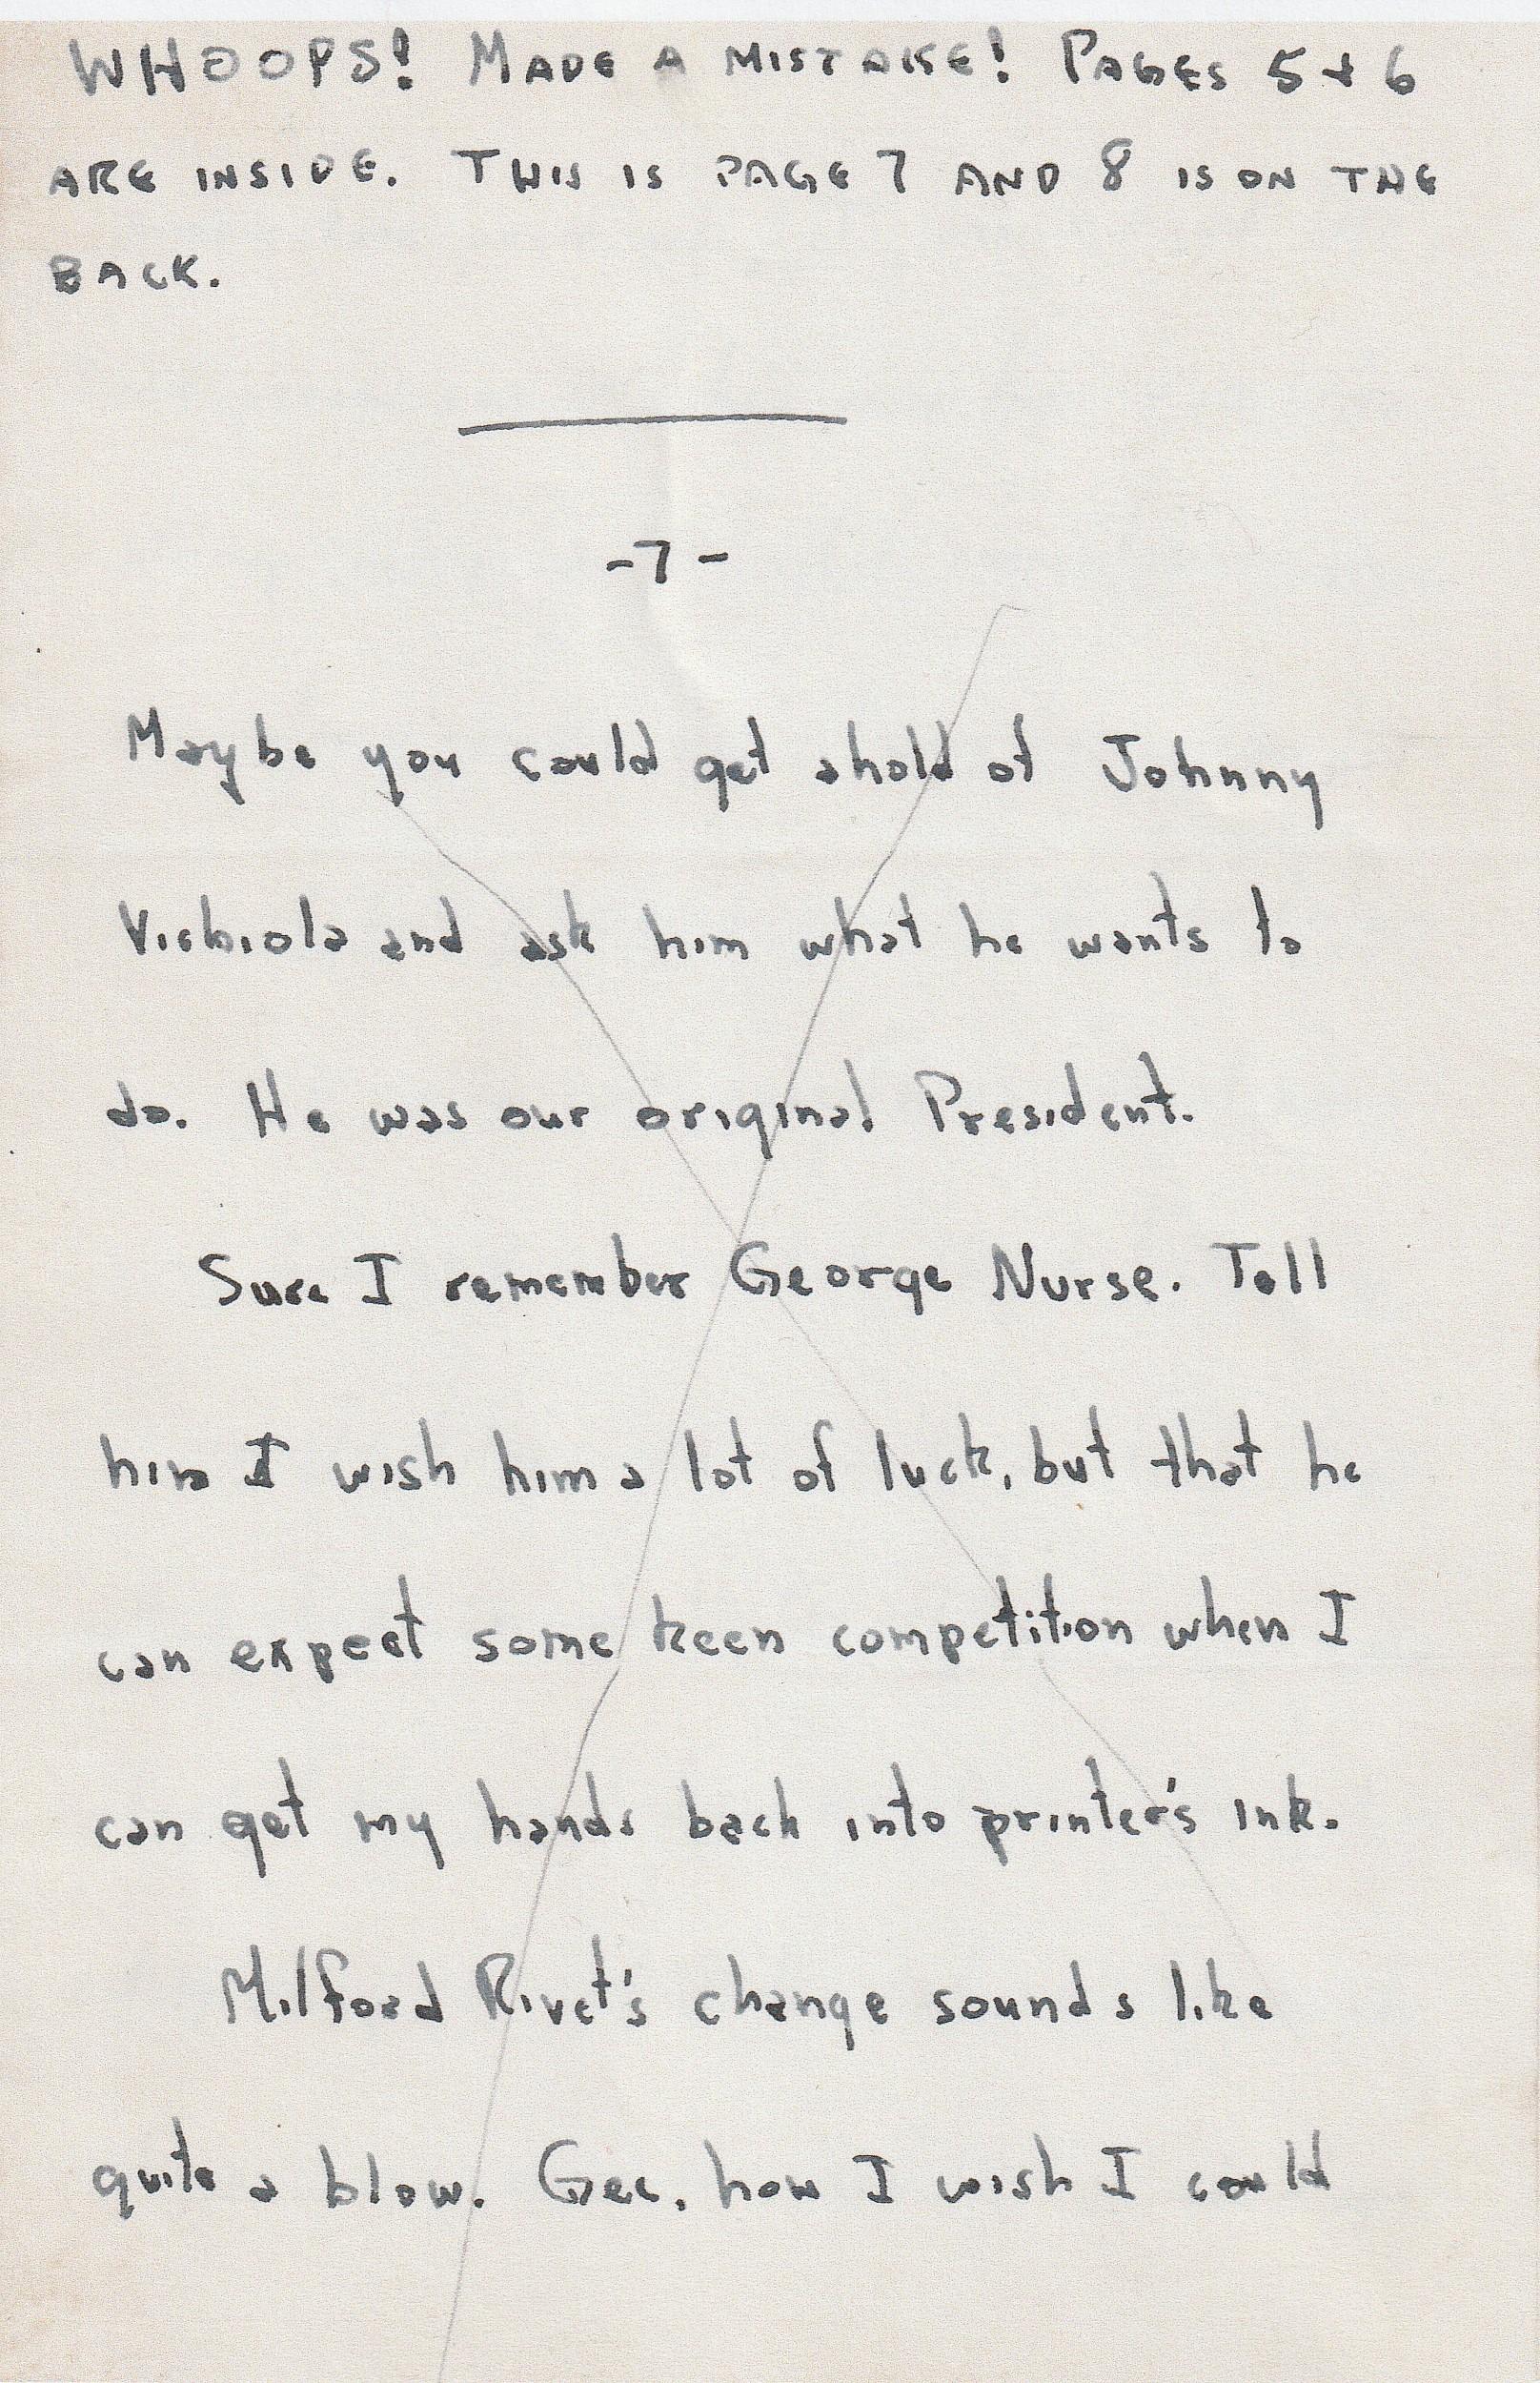 World War II Army Adventure (119) Dear Dad (2) - January 11, 1946